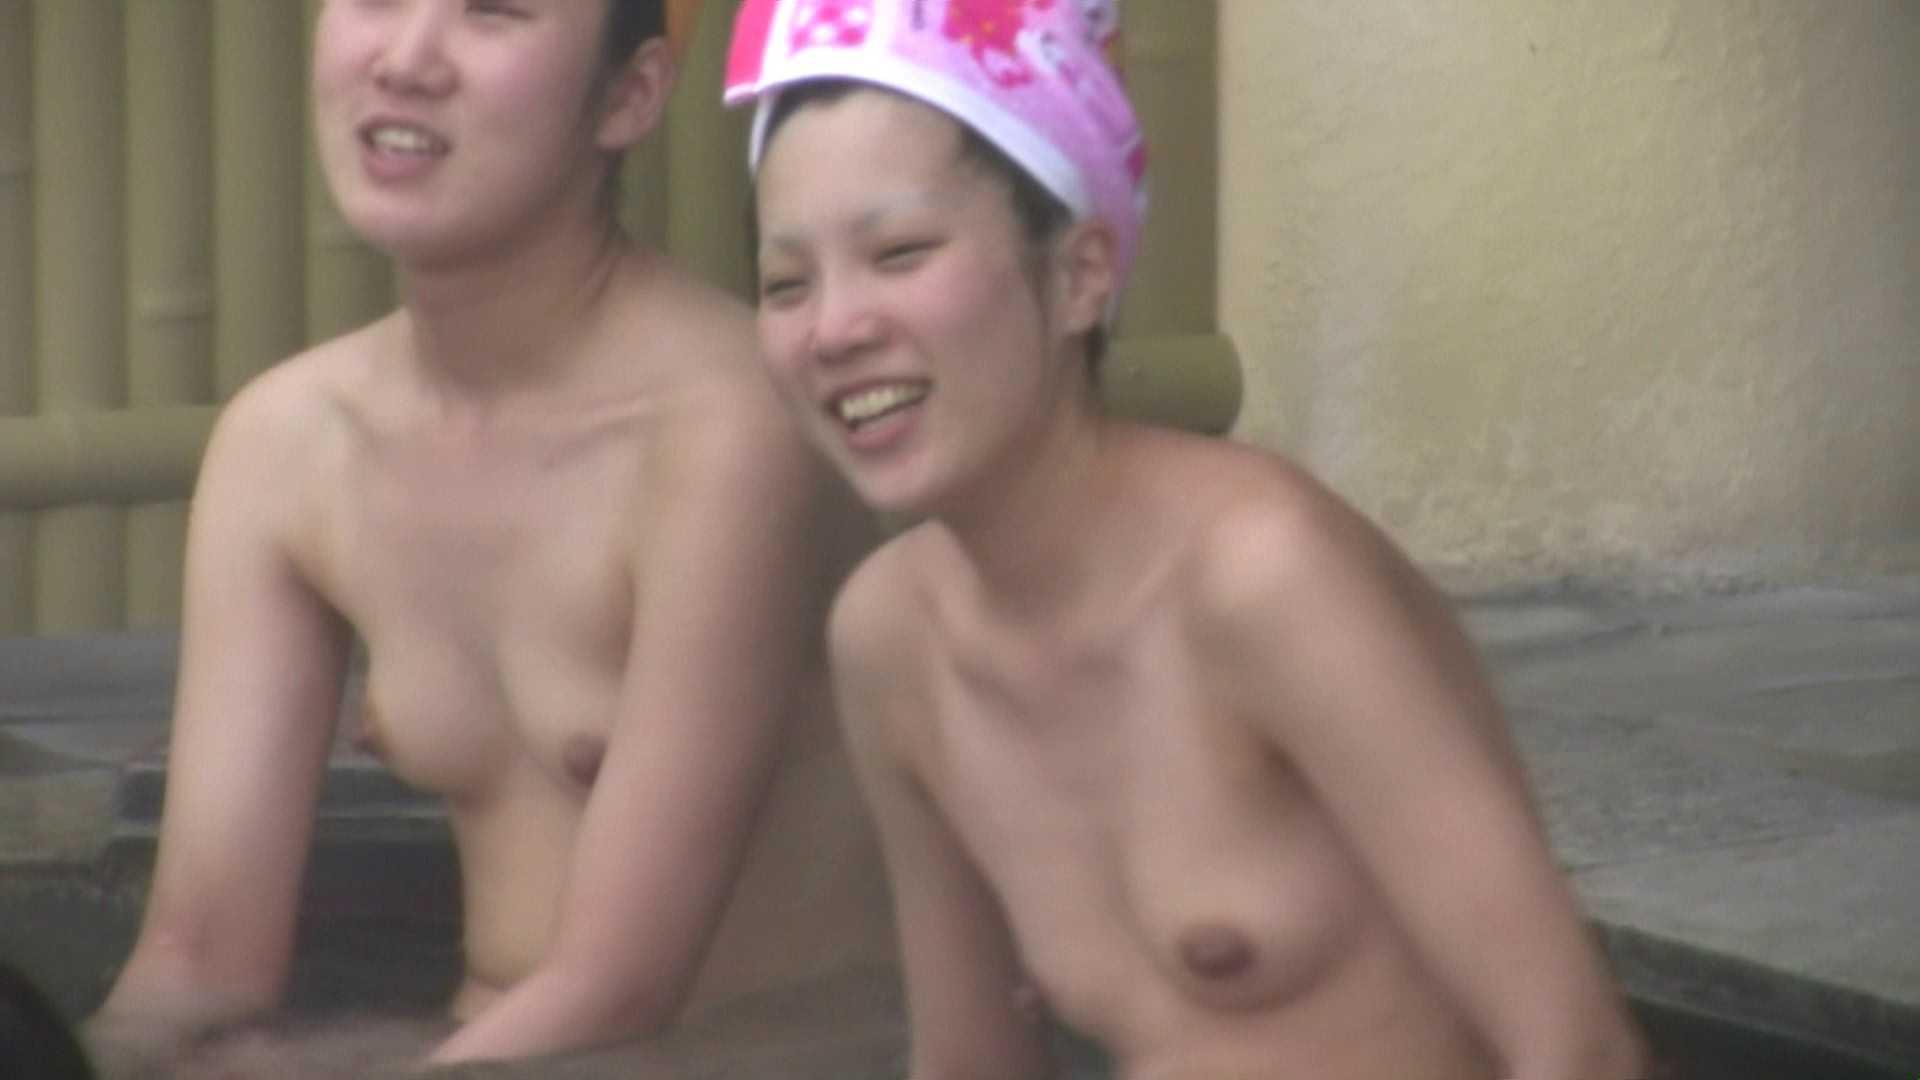 Aquaな露天風呂Vol.51【VIP限定】 露天風呂編  79PIX 4